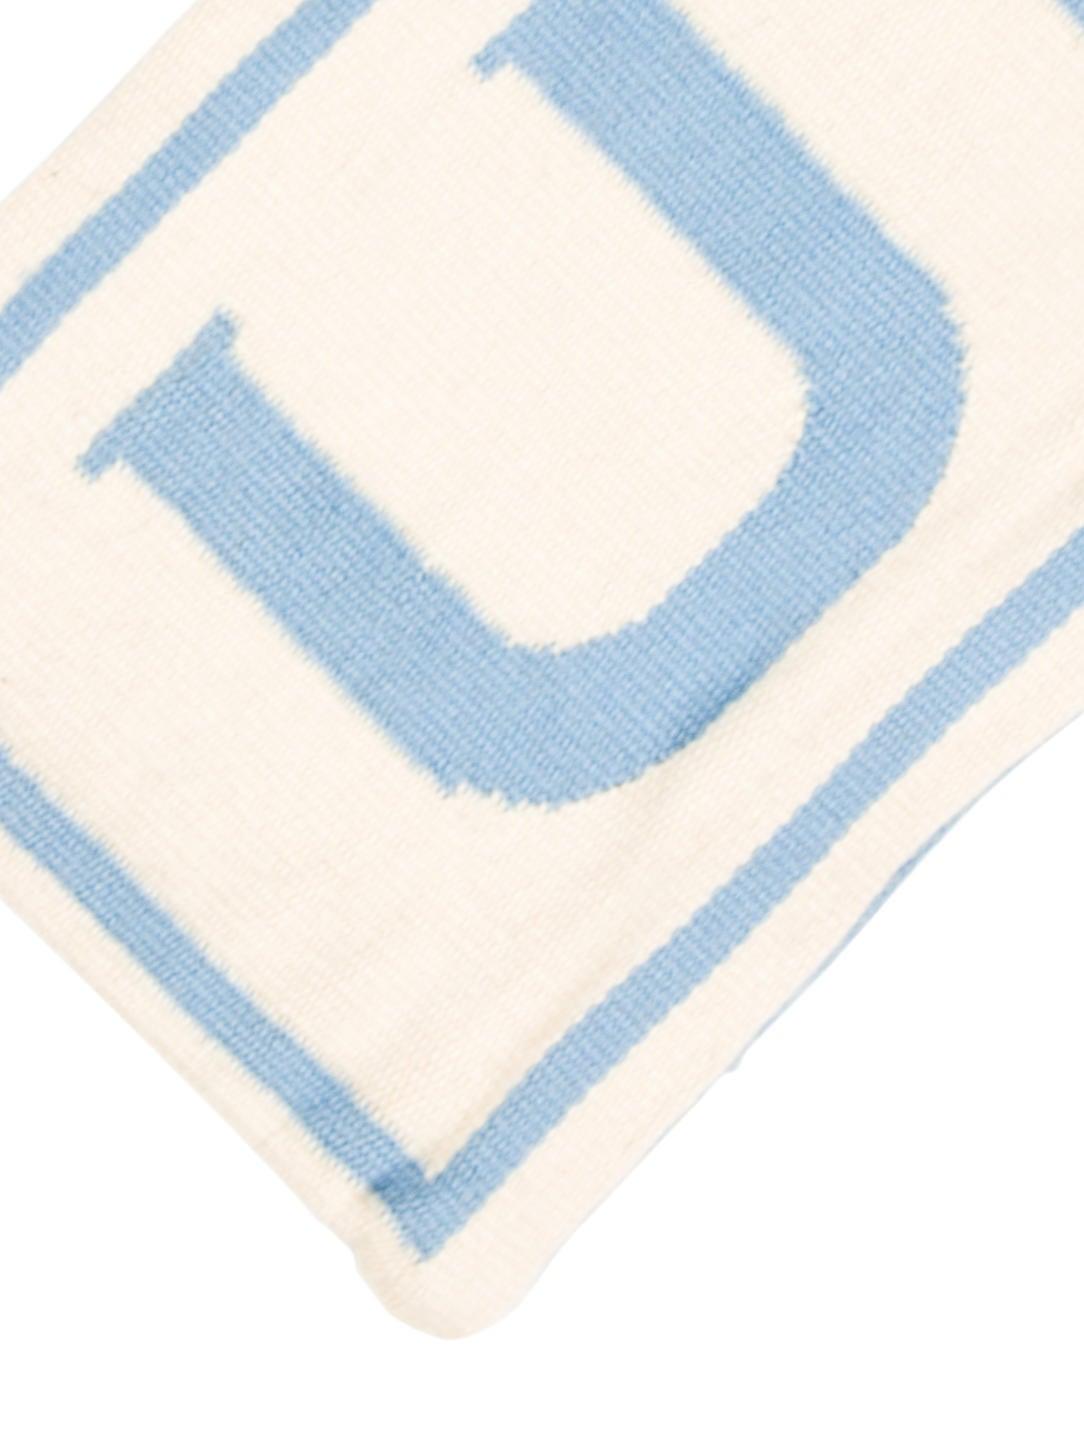 Letter A Throw Pillow : Jonathan Adler Reversible Junior Letter Throw Pillow Case - Bedding And Bath - JTADL20512 The ...